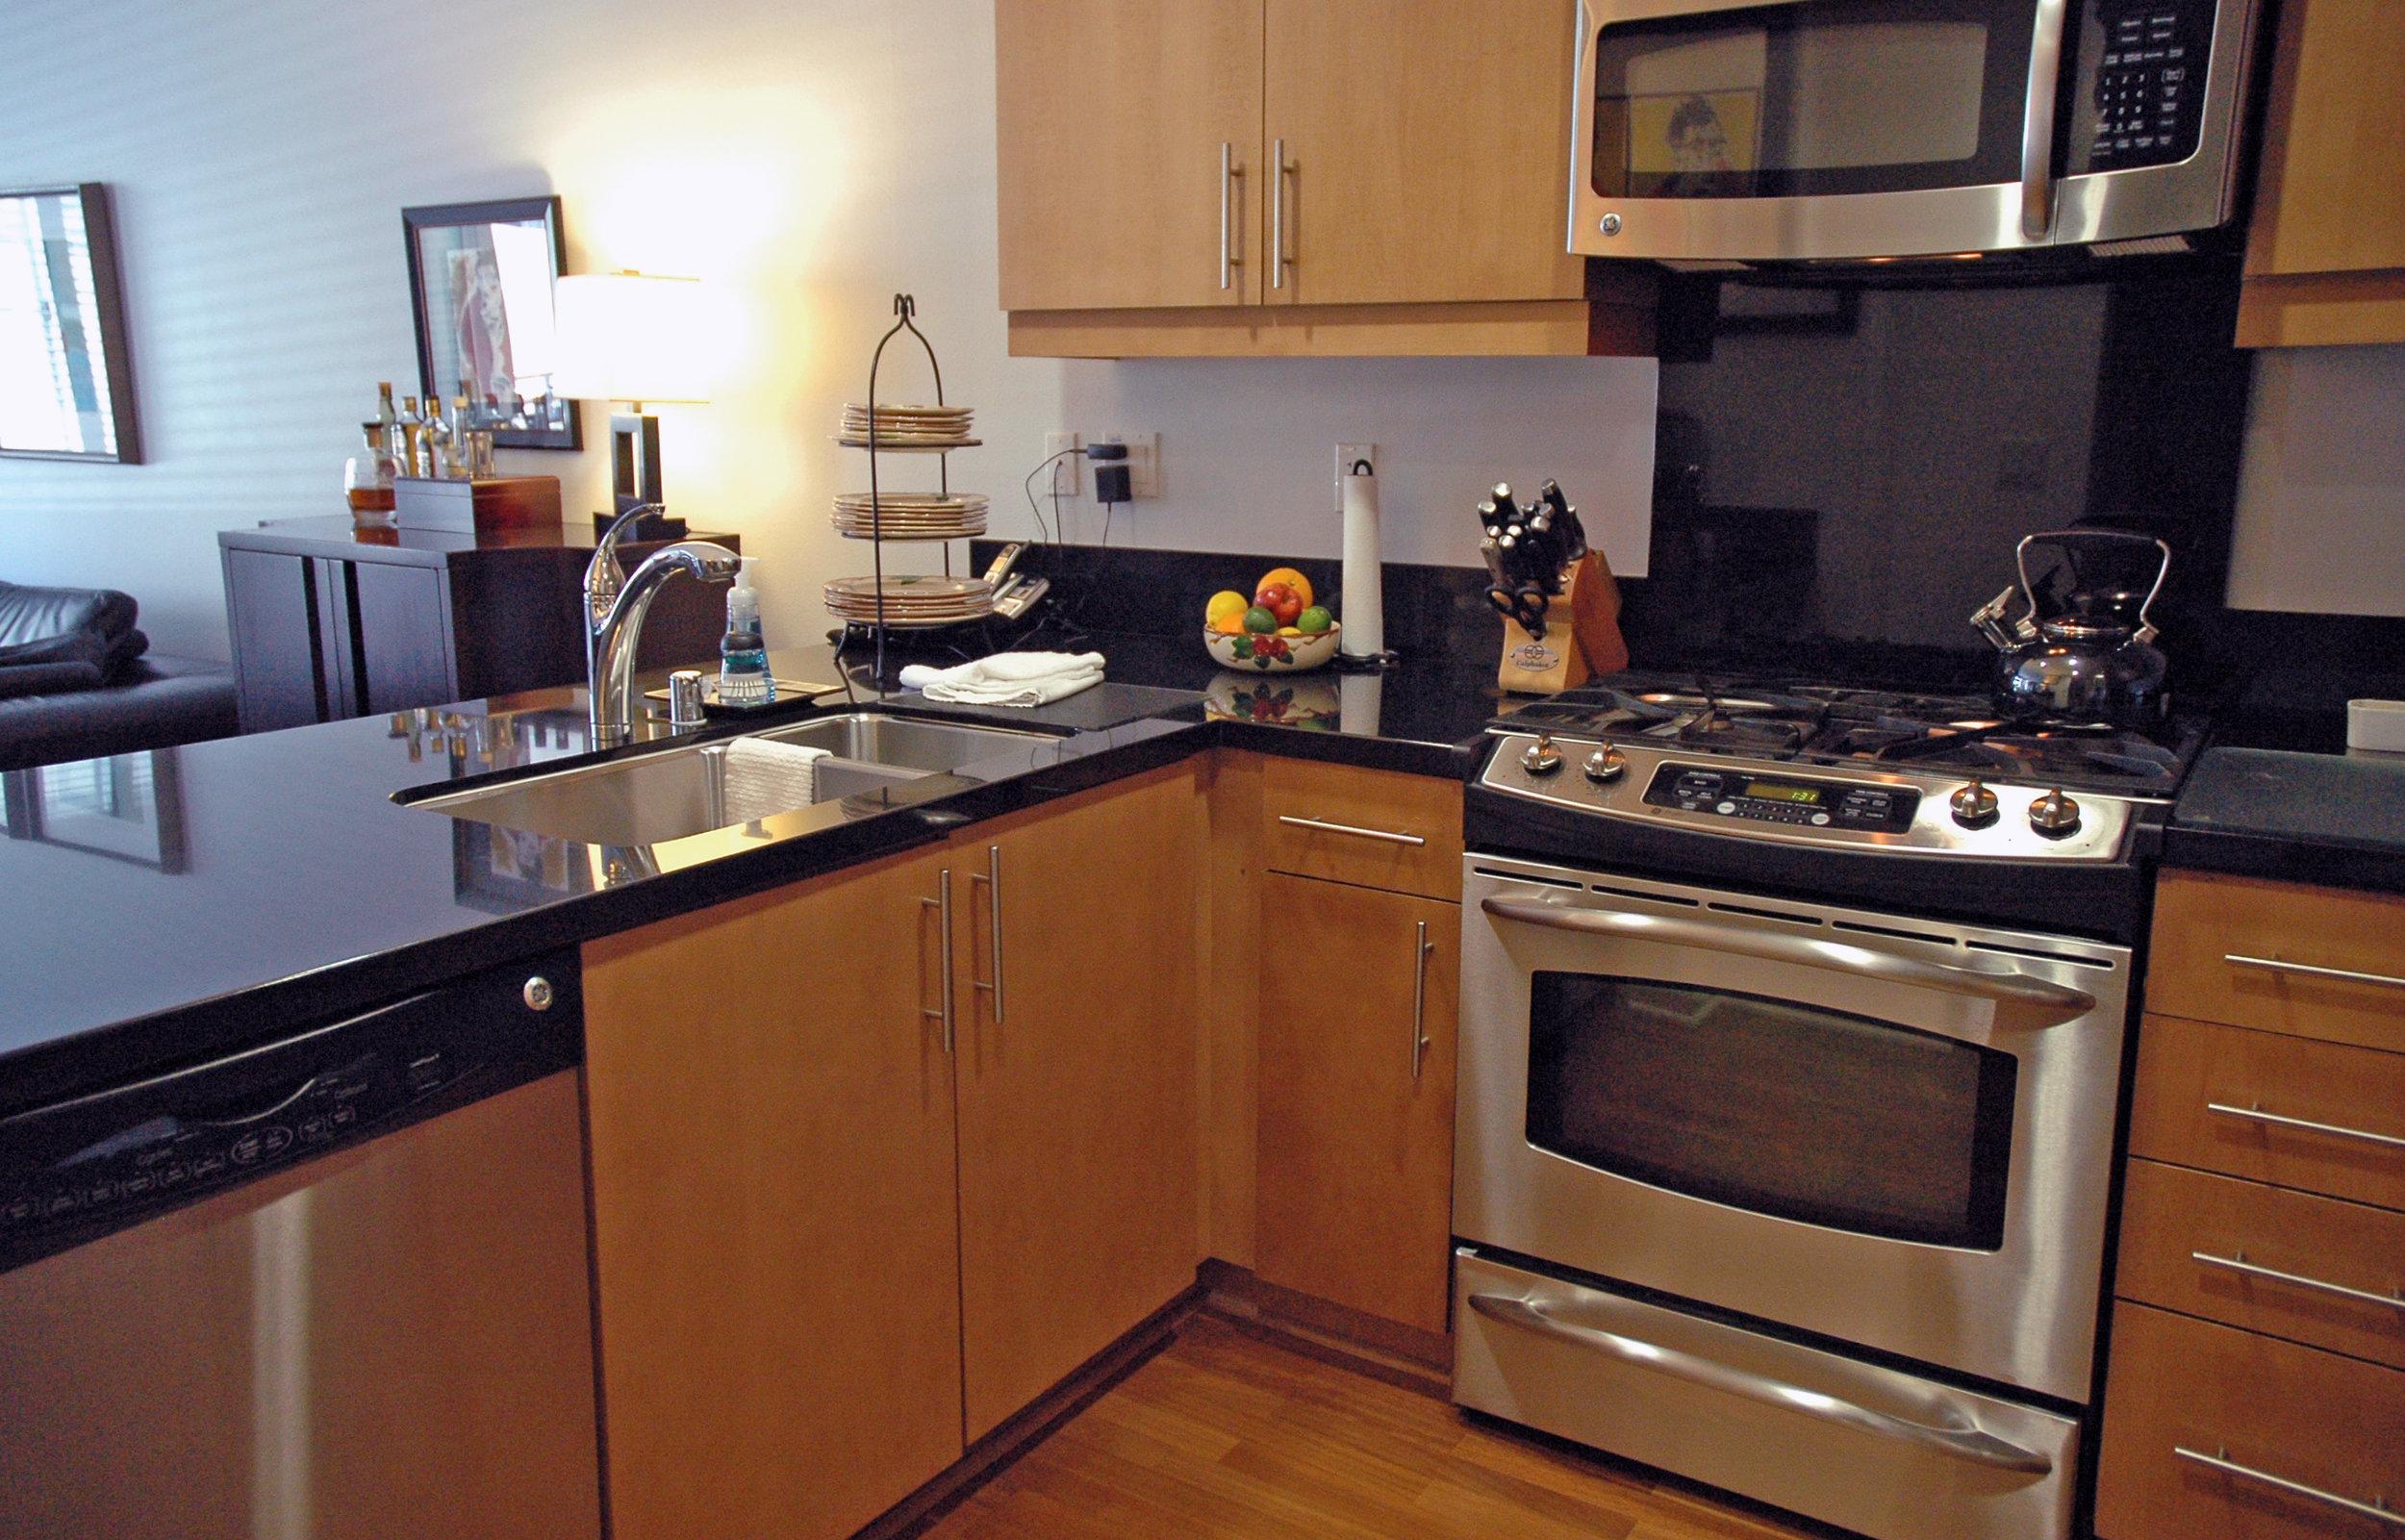 211-kitchen_edited-1_7269531576_o.jpg